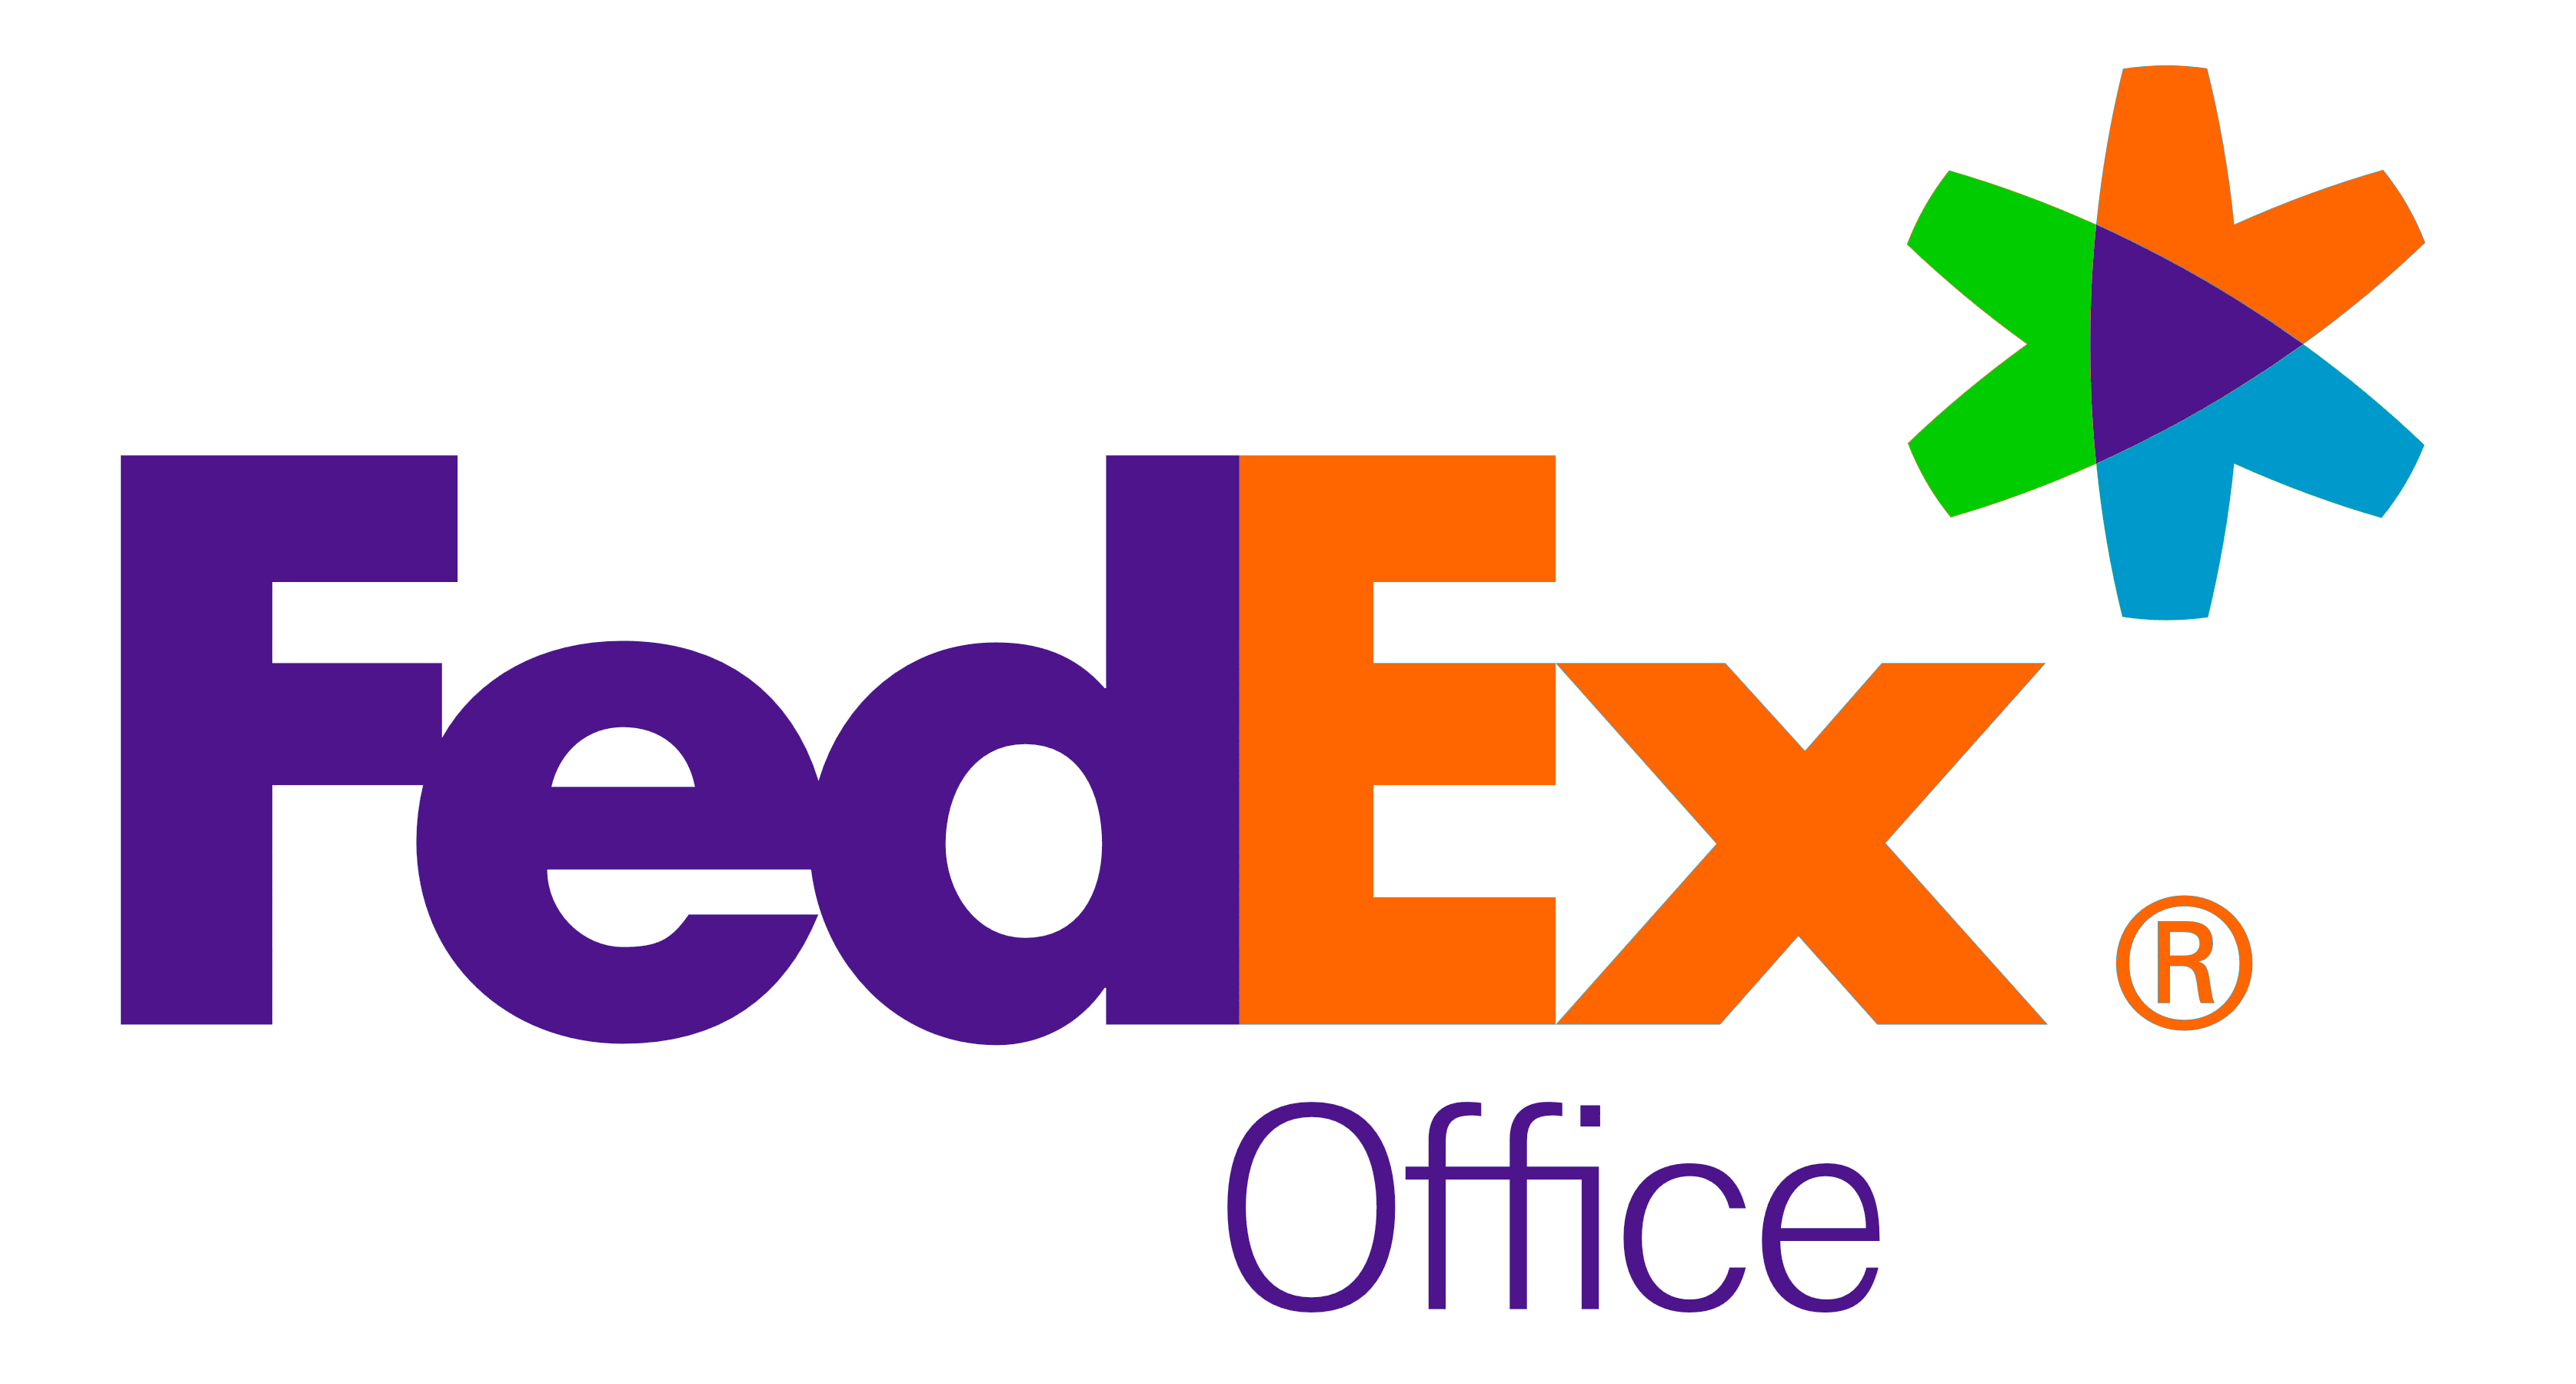 Fedex Office Logo PNG